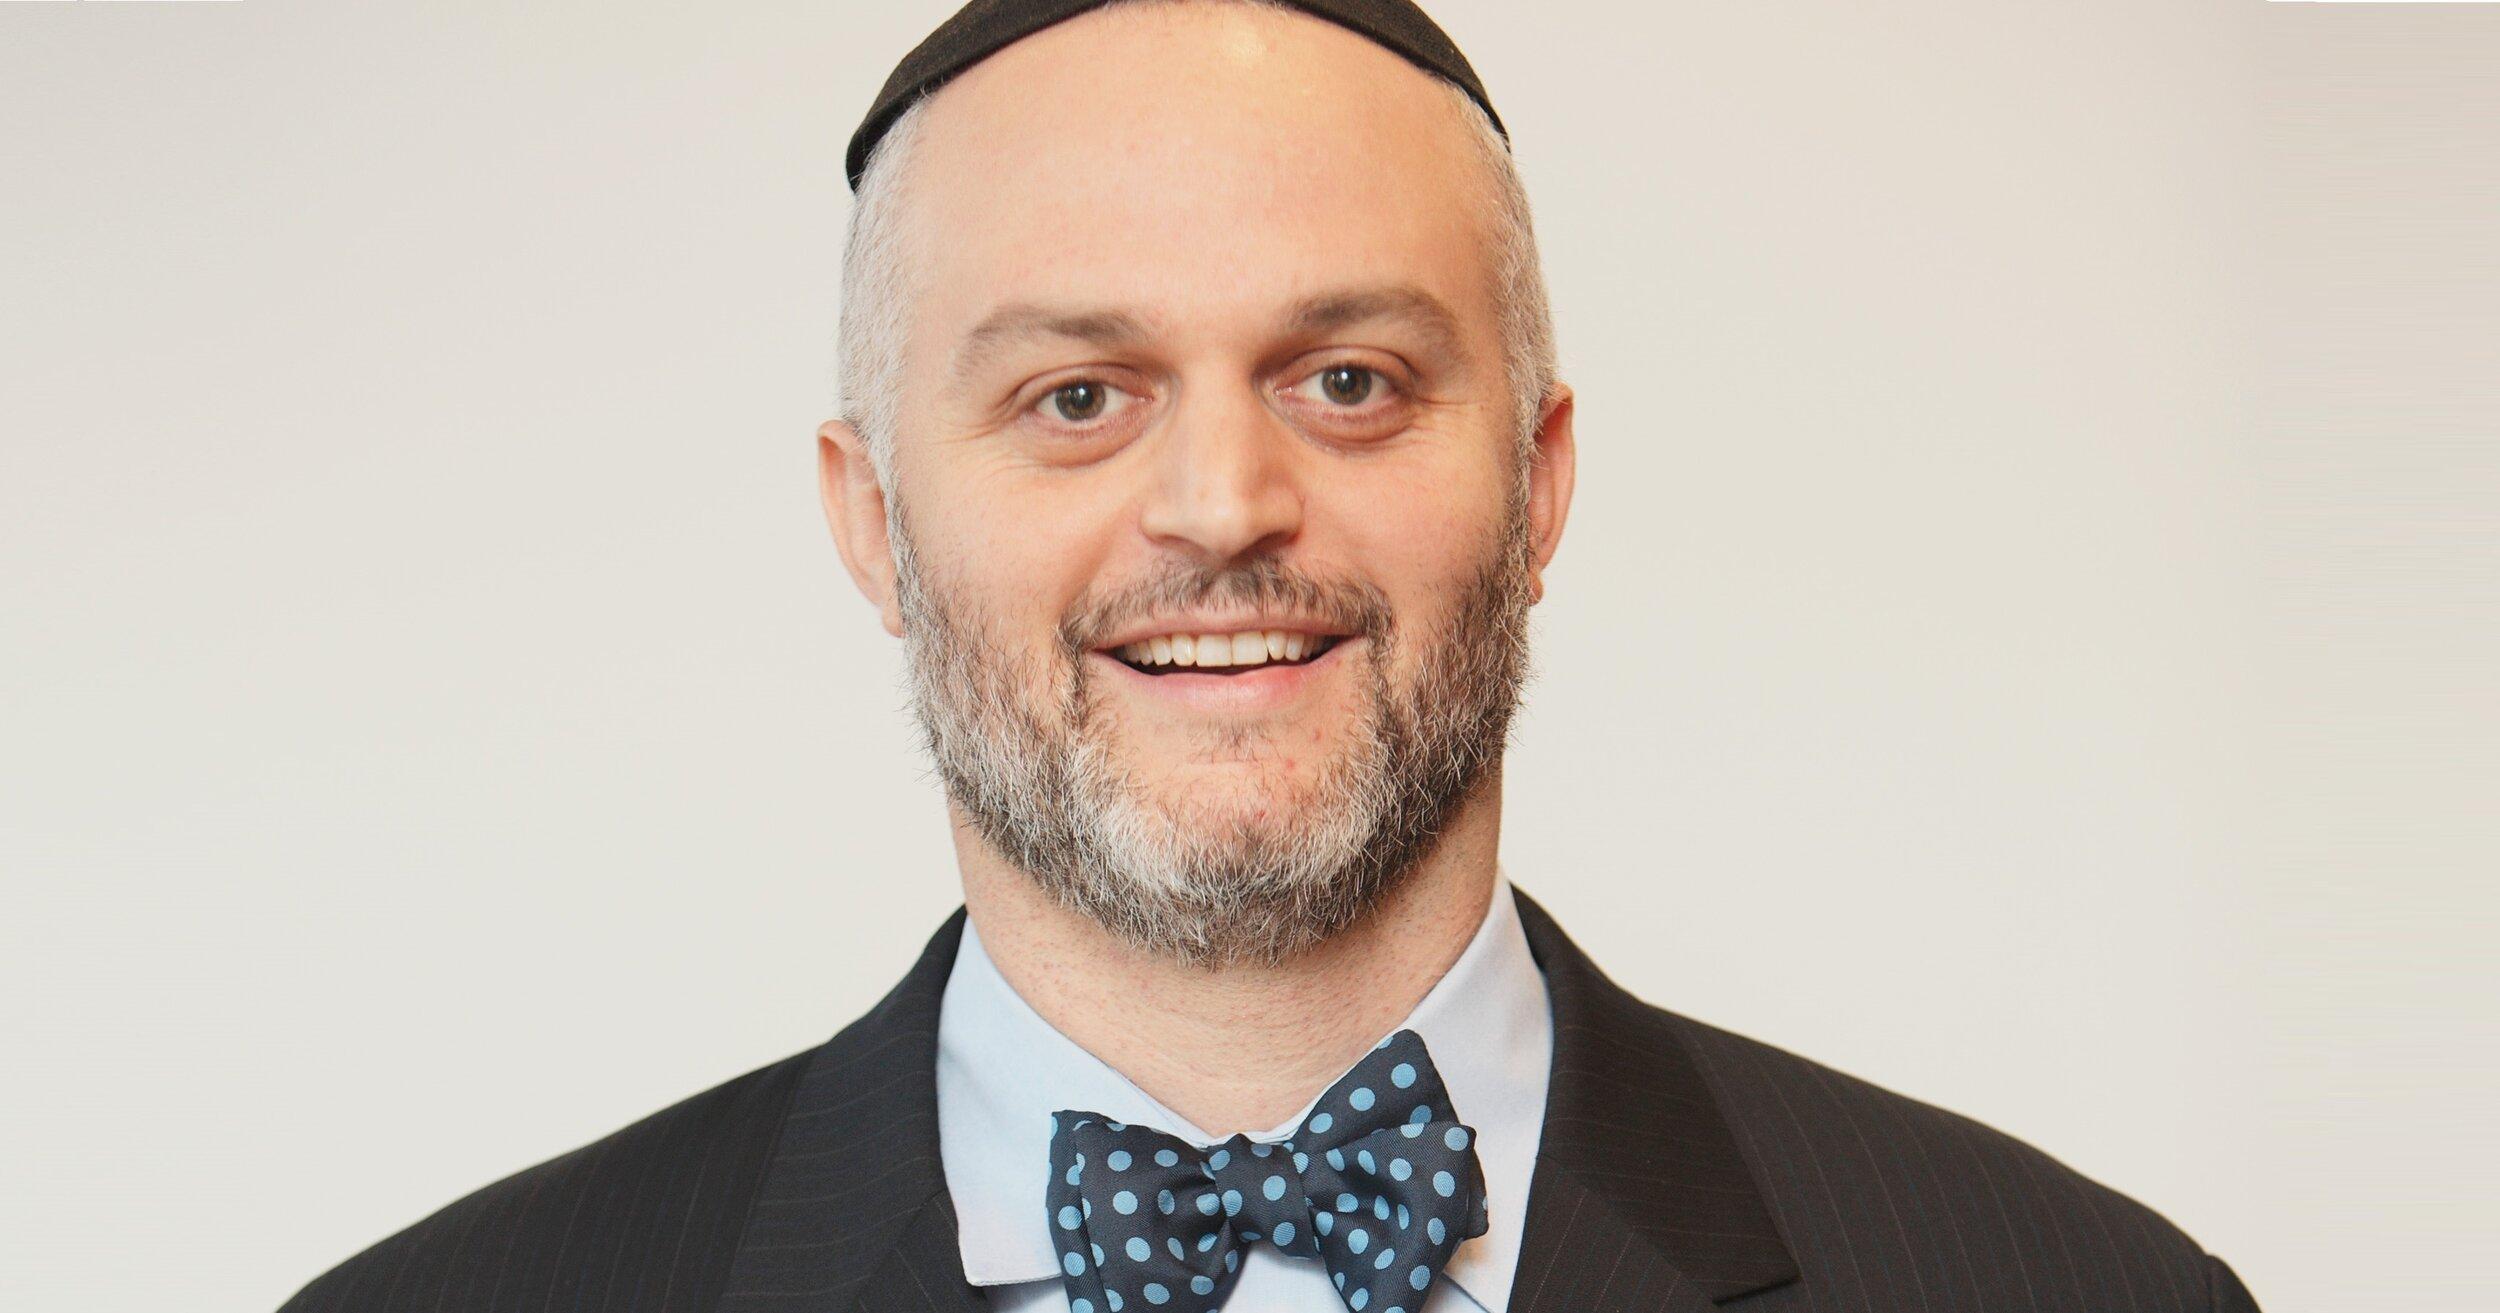 Episode 190: Jewish Camps, Jewish Utopias - Avi Orlow